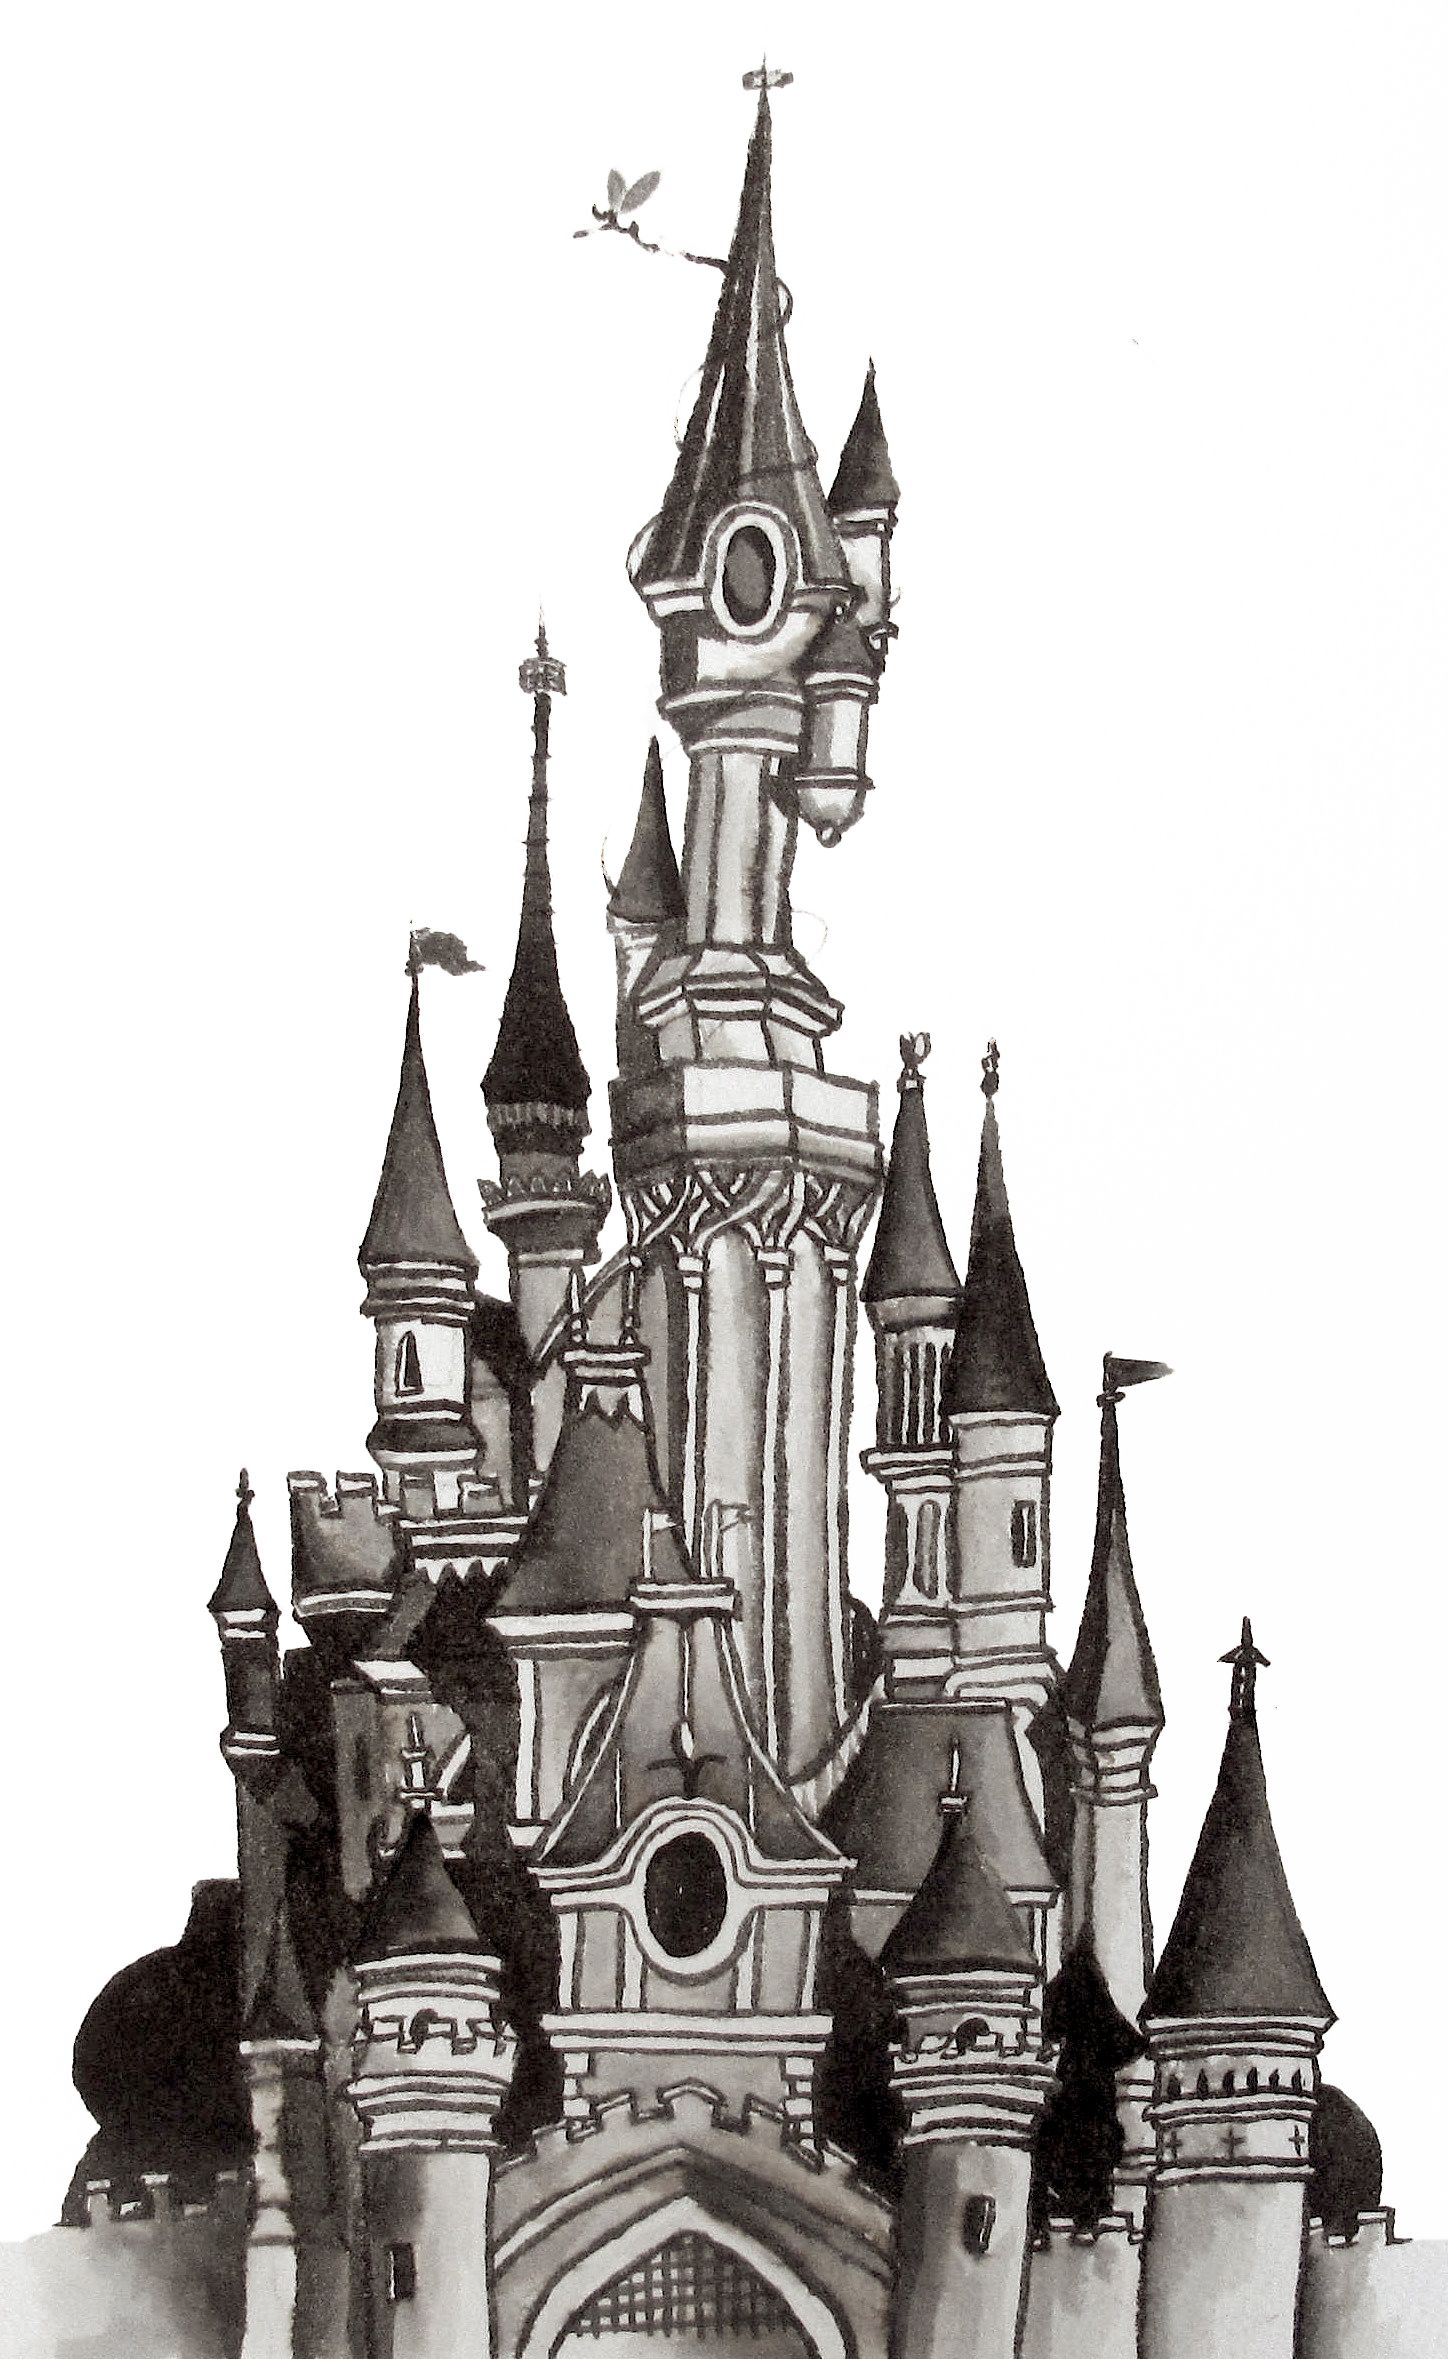 Architectural Ink Drawing Illustration Of Disneyland